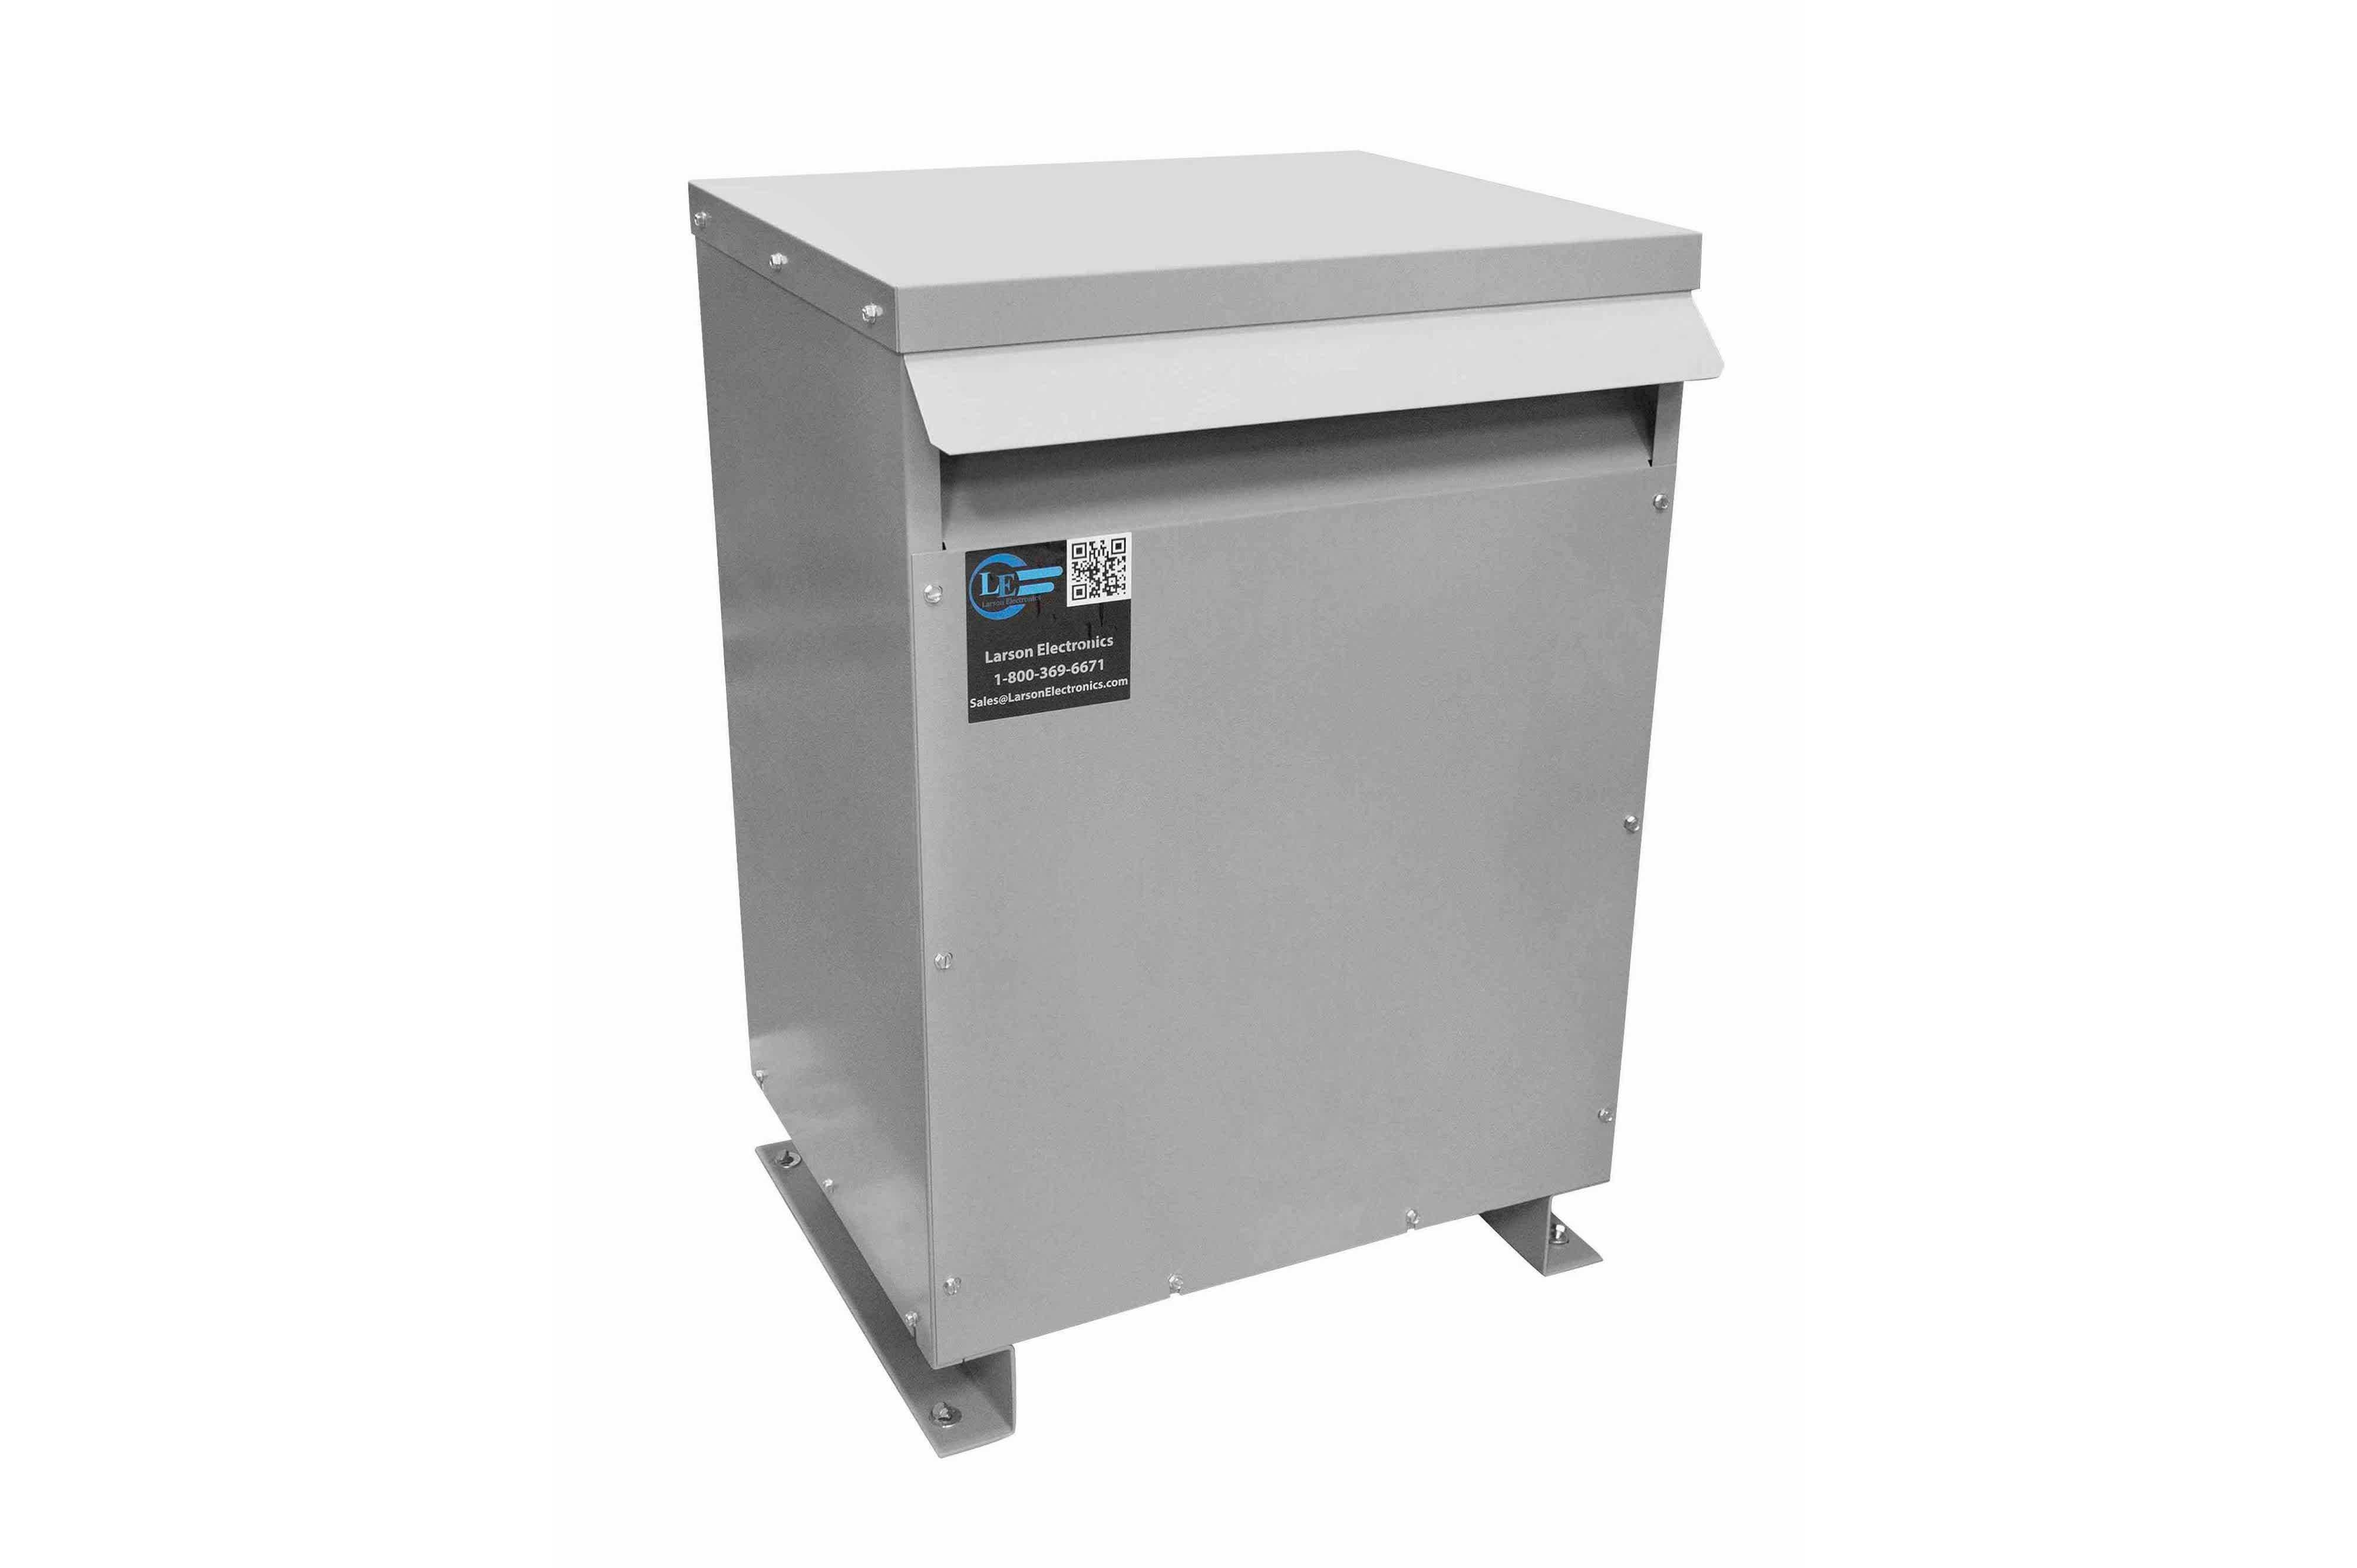 167 kVA 3PH Isolation Transformer, 240V Wye Primary, 600Y/347 Wye-N Secondary, N3R, Ventilated, 60 Hz